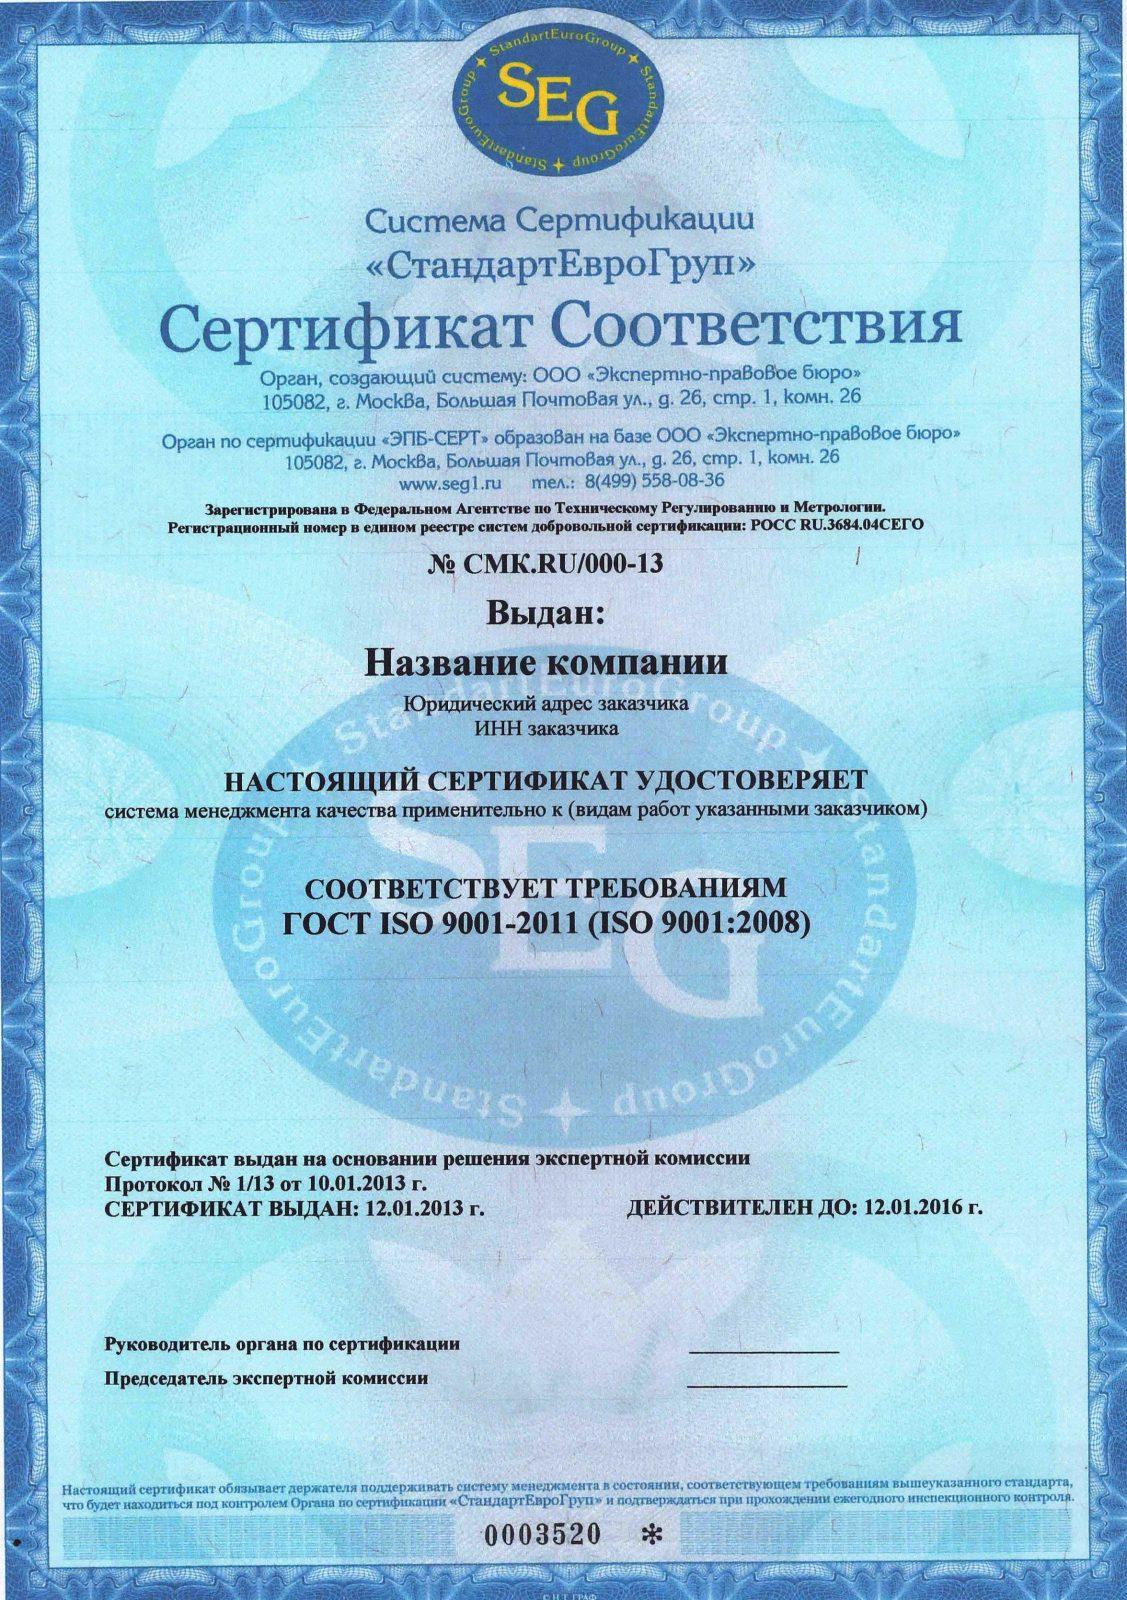 СЕРТИФИКАТ ИСО 9001 ОБРАЗЕЦ1